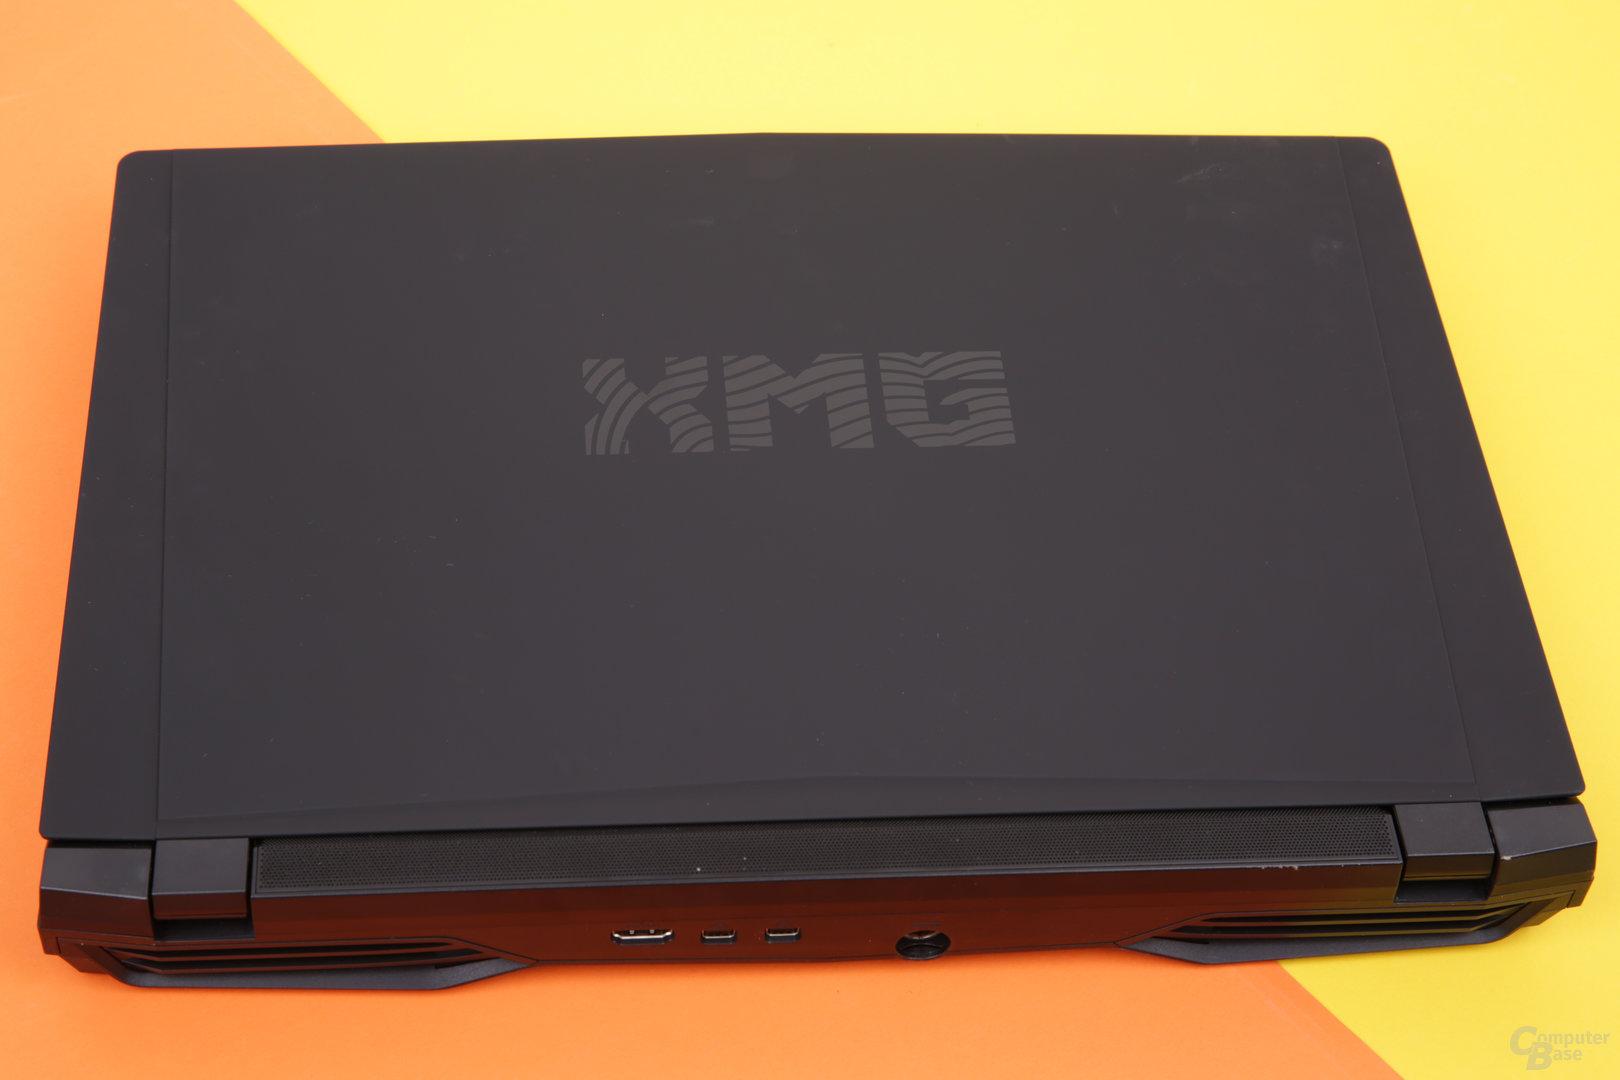 Schenker XMG U507 Ultimate